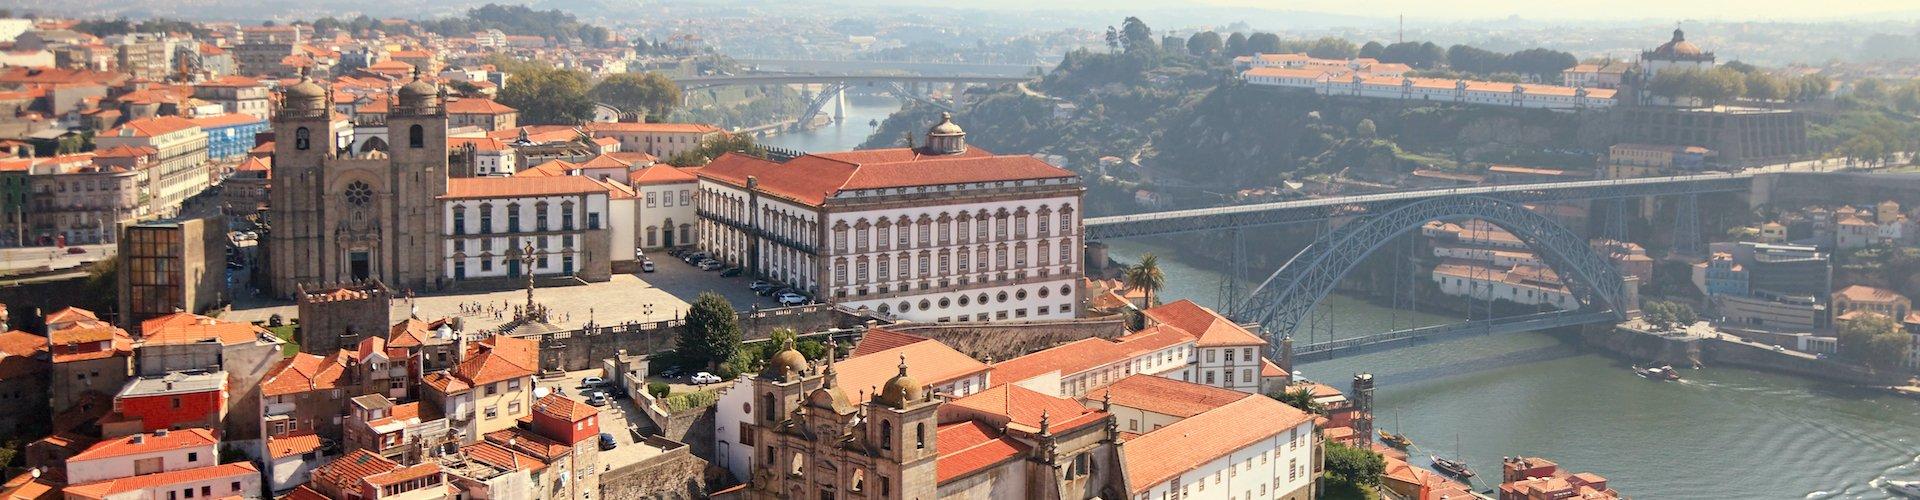 Ausflugsziel Porto